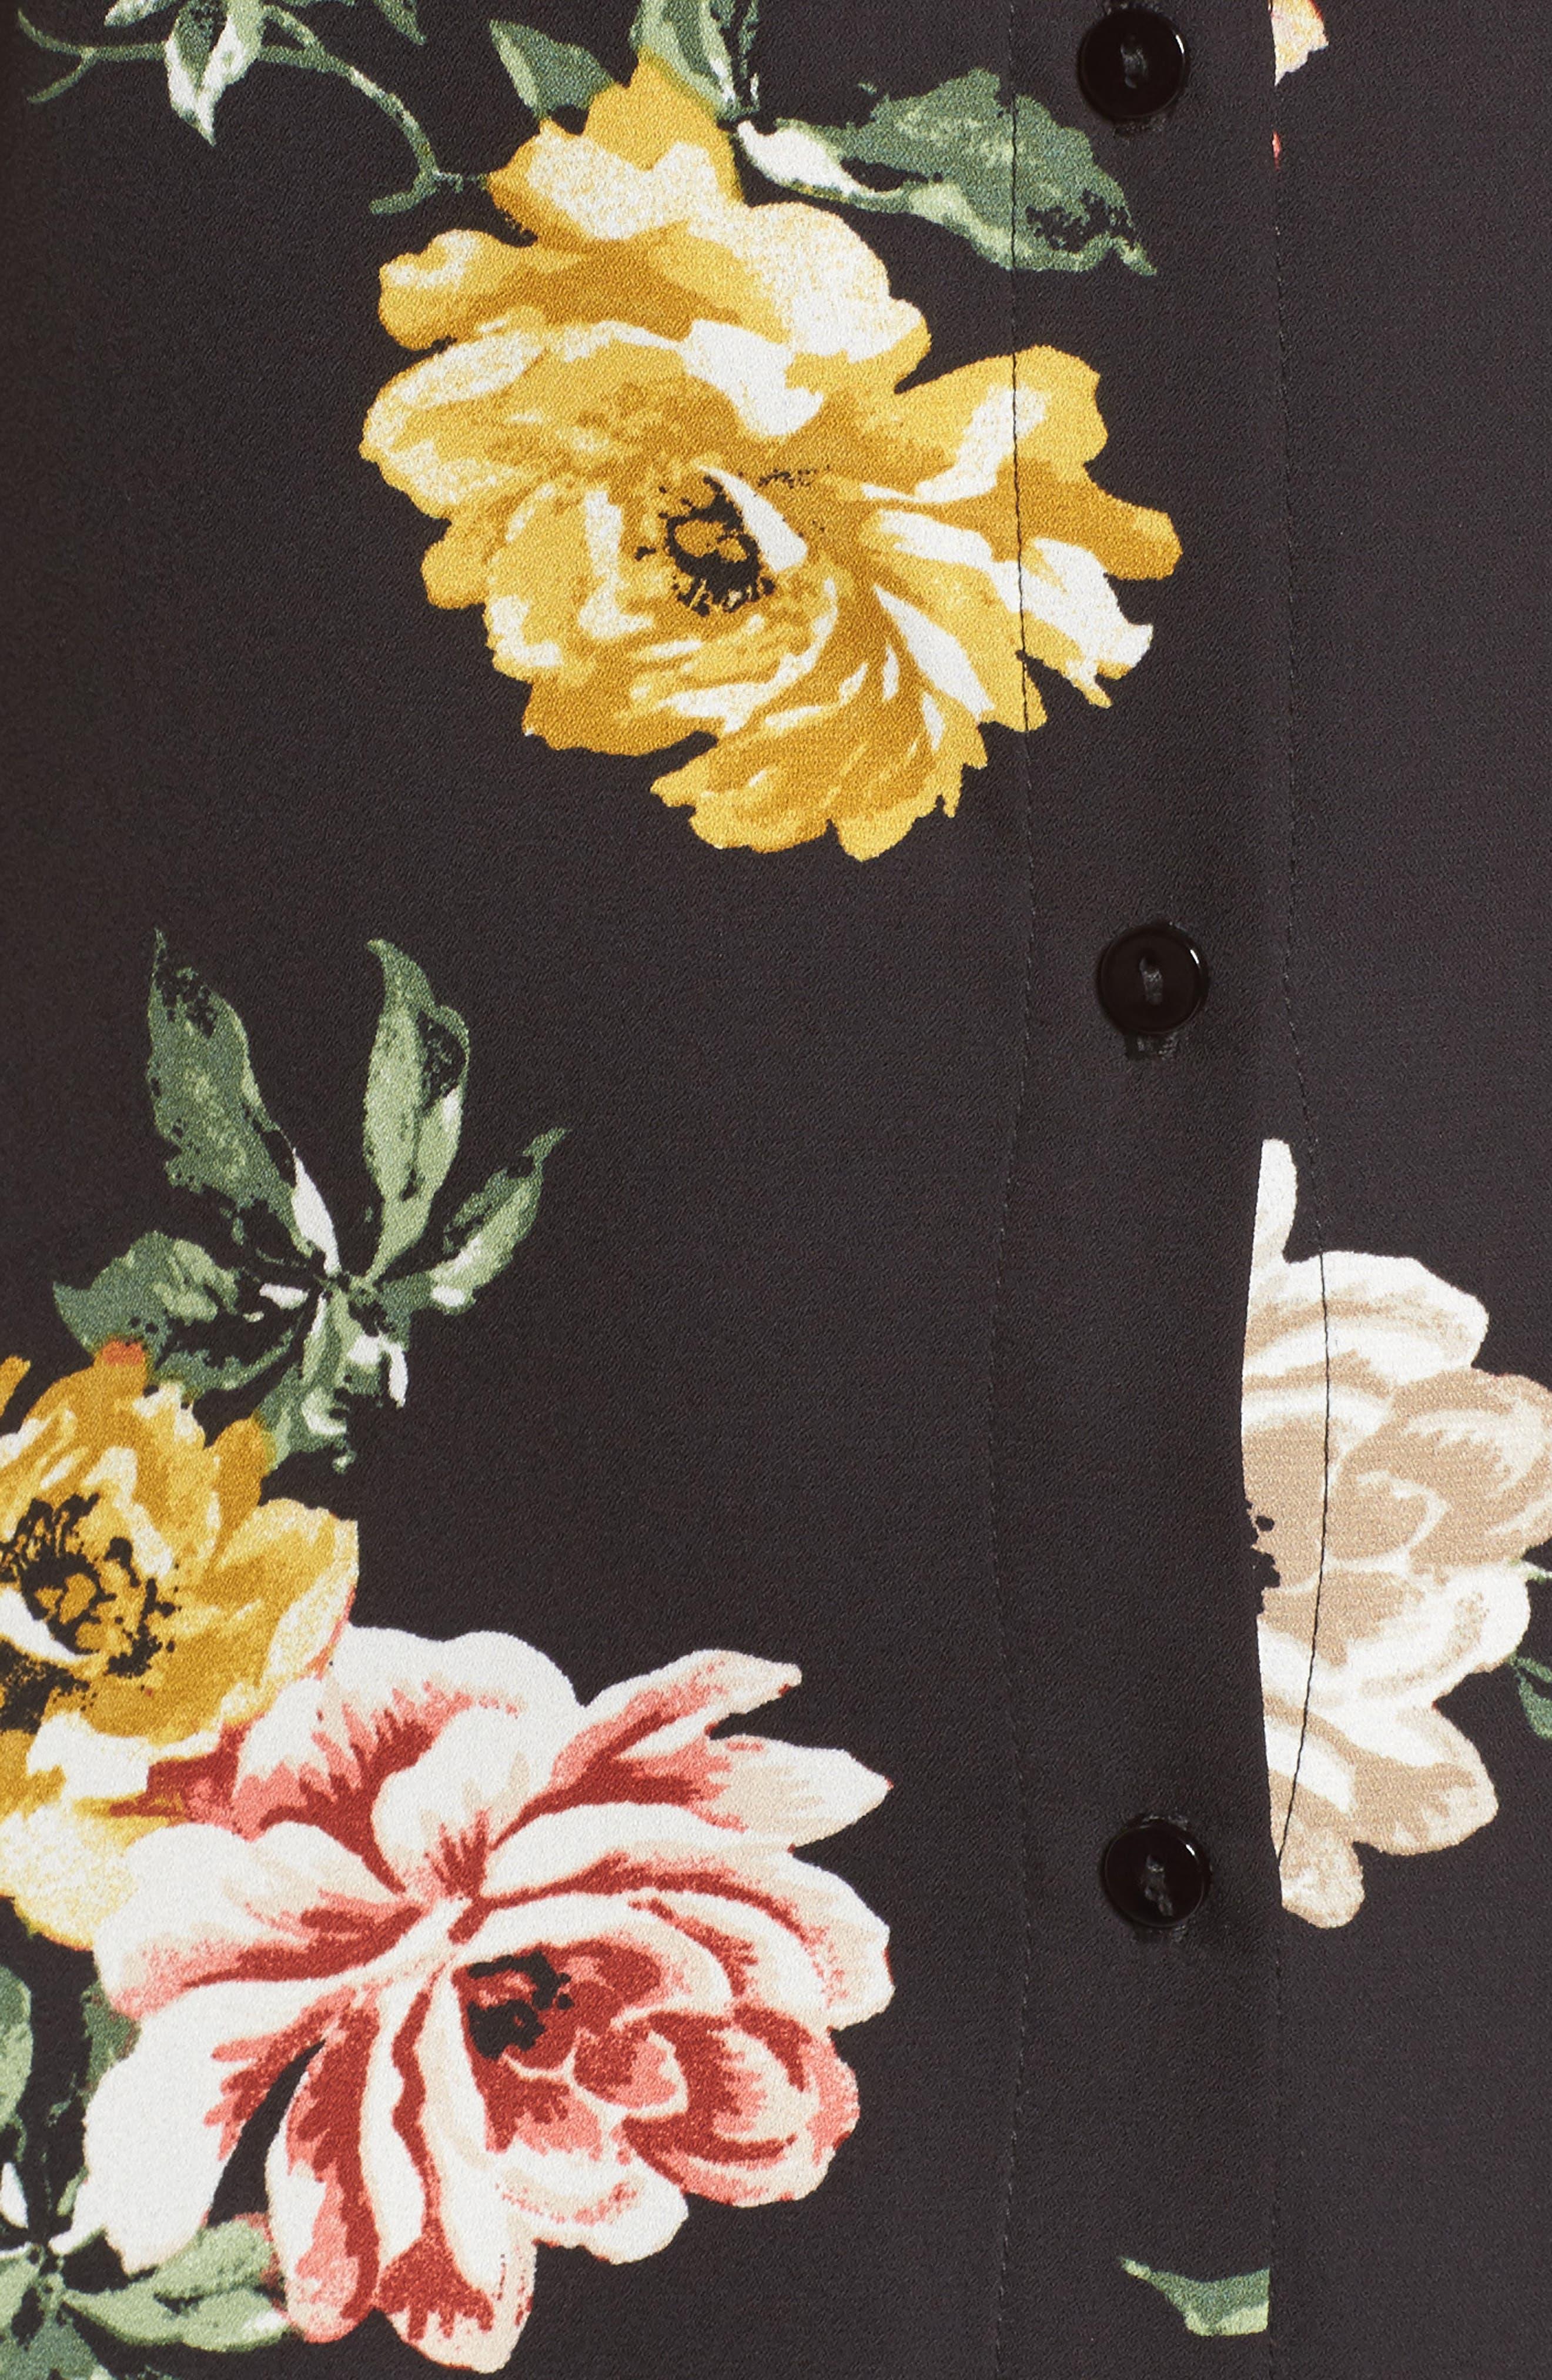 Floral Ruffle Strap Maxi Dress,                             Alternate thumbnail 5, color,                             Black Large Floral Print